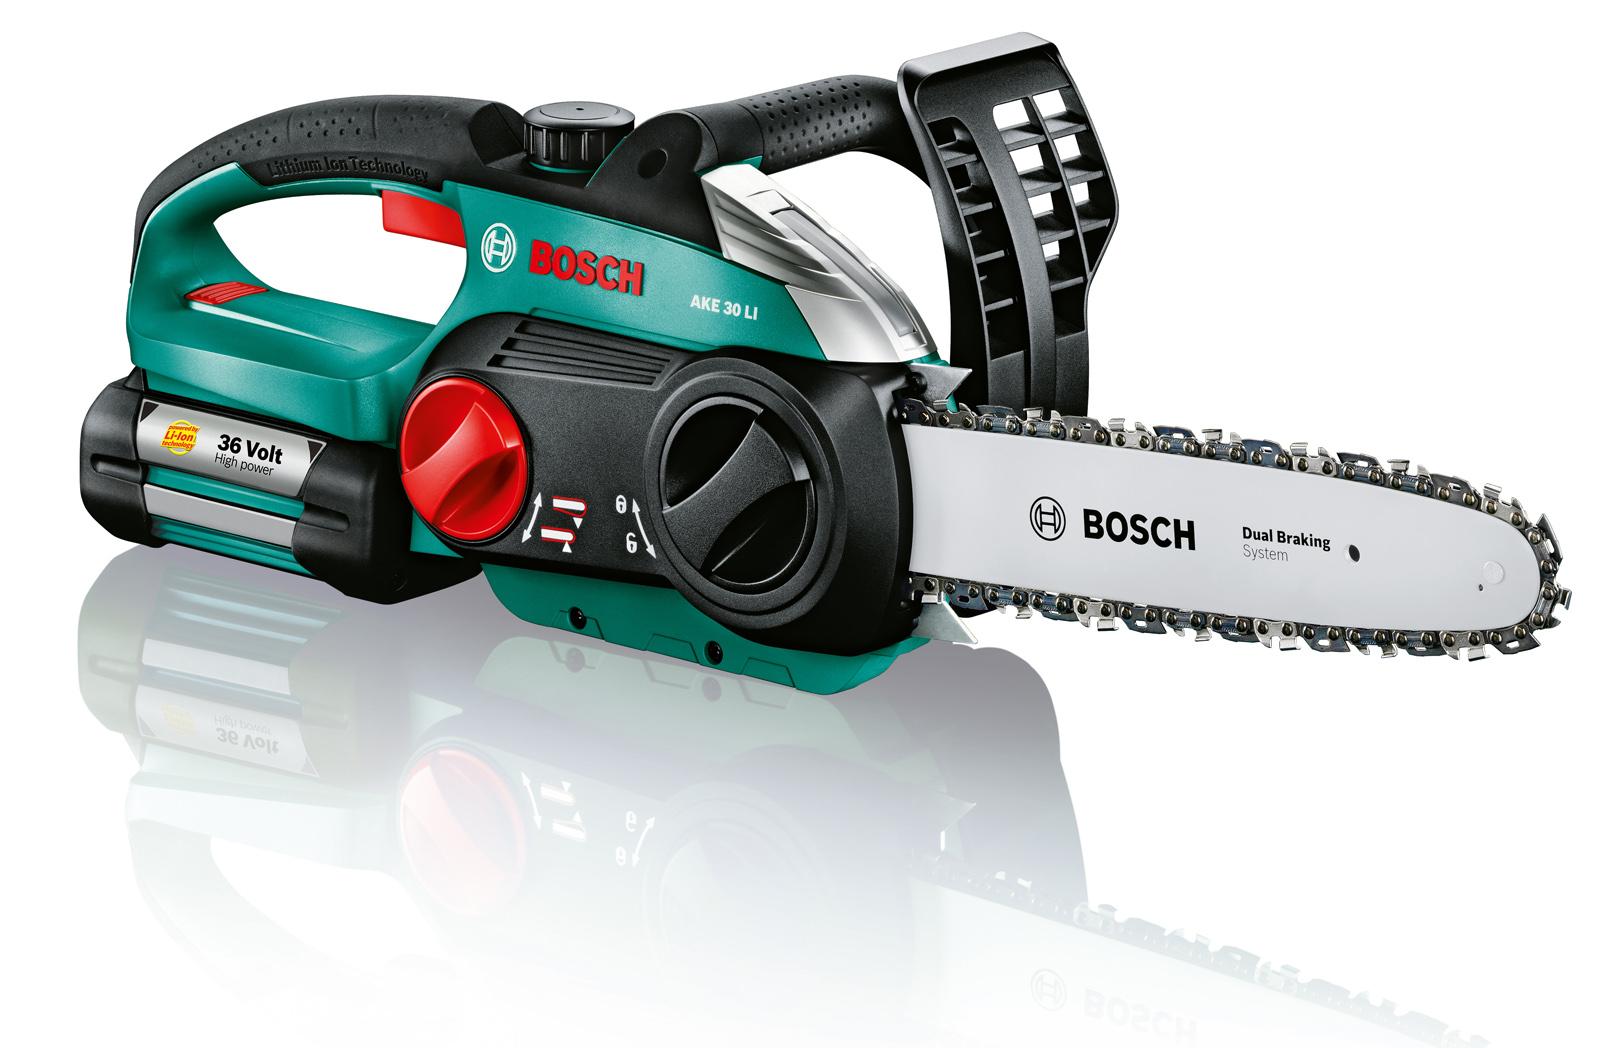 Пила цепная Bosch Ake 30 li (0.600.837.100) пила цепная аккумуляторная bosch ake 30 li